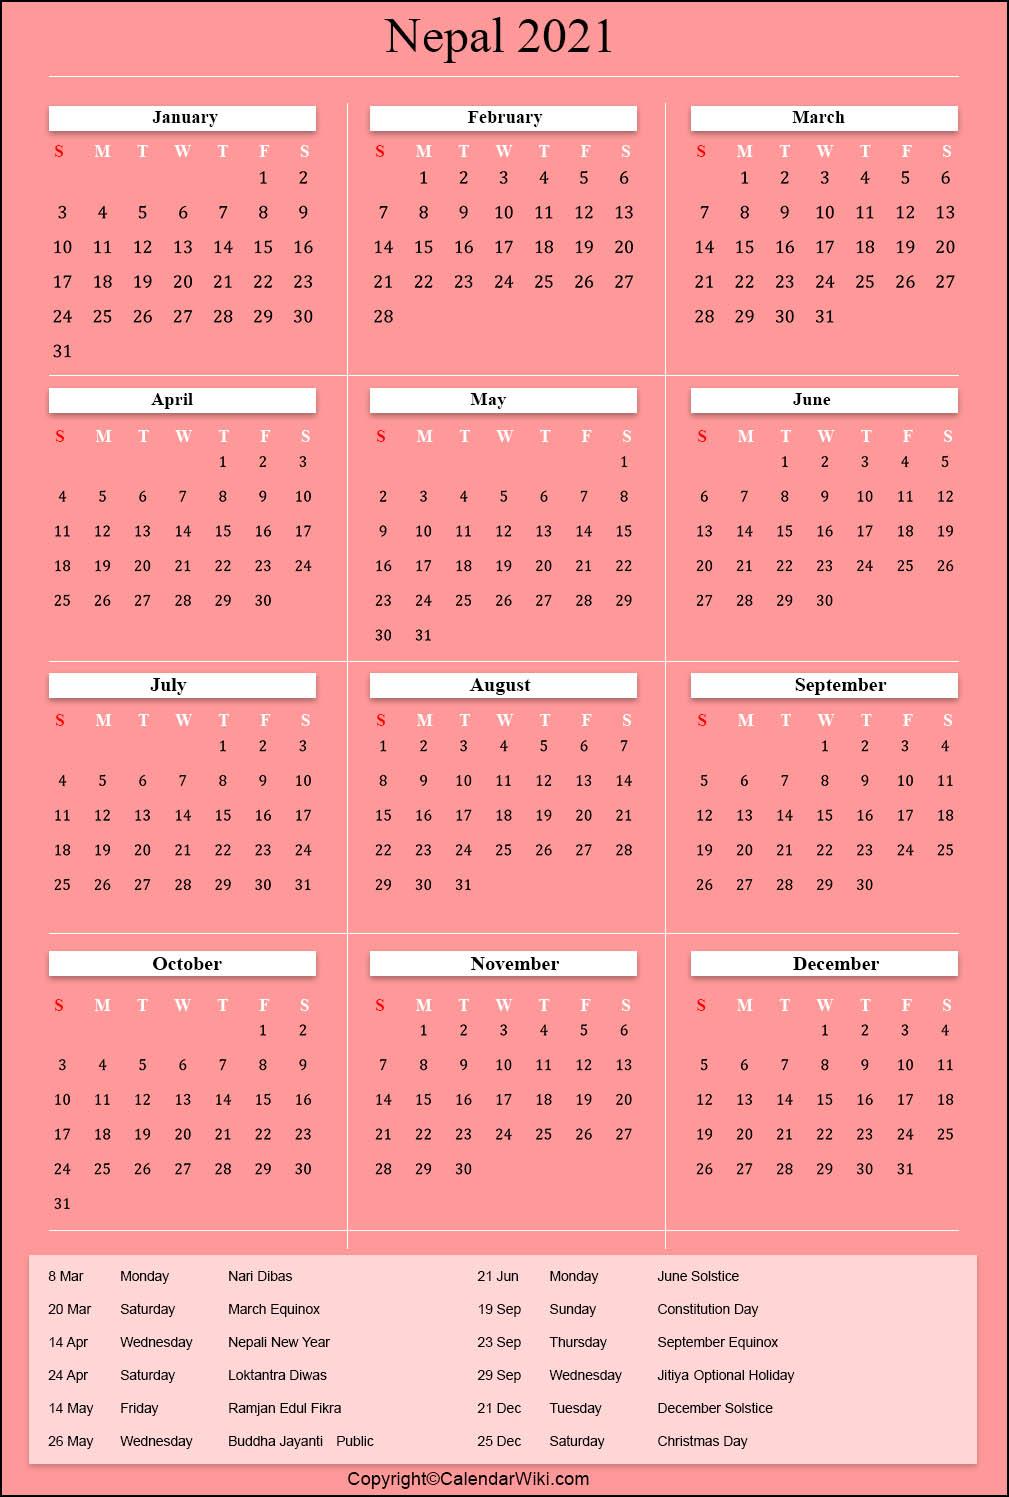 Printable Nepal Calendar 2021 with Holidays [Public Holidays]